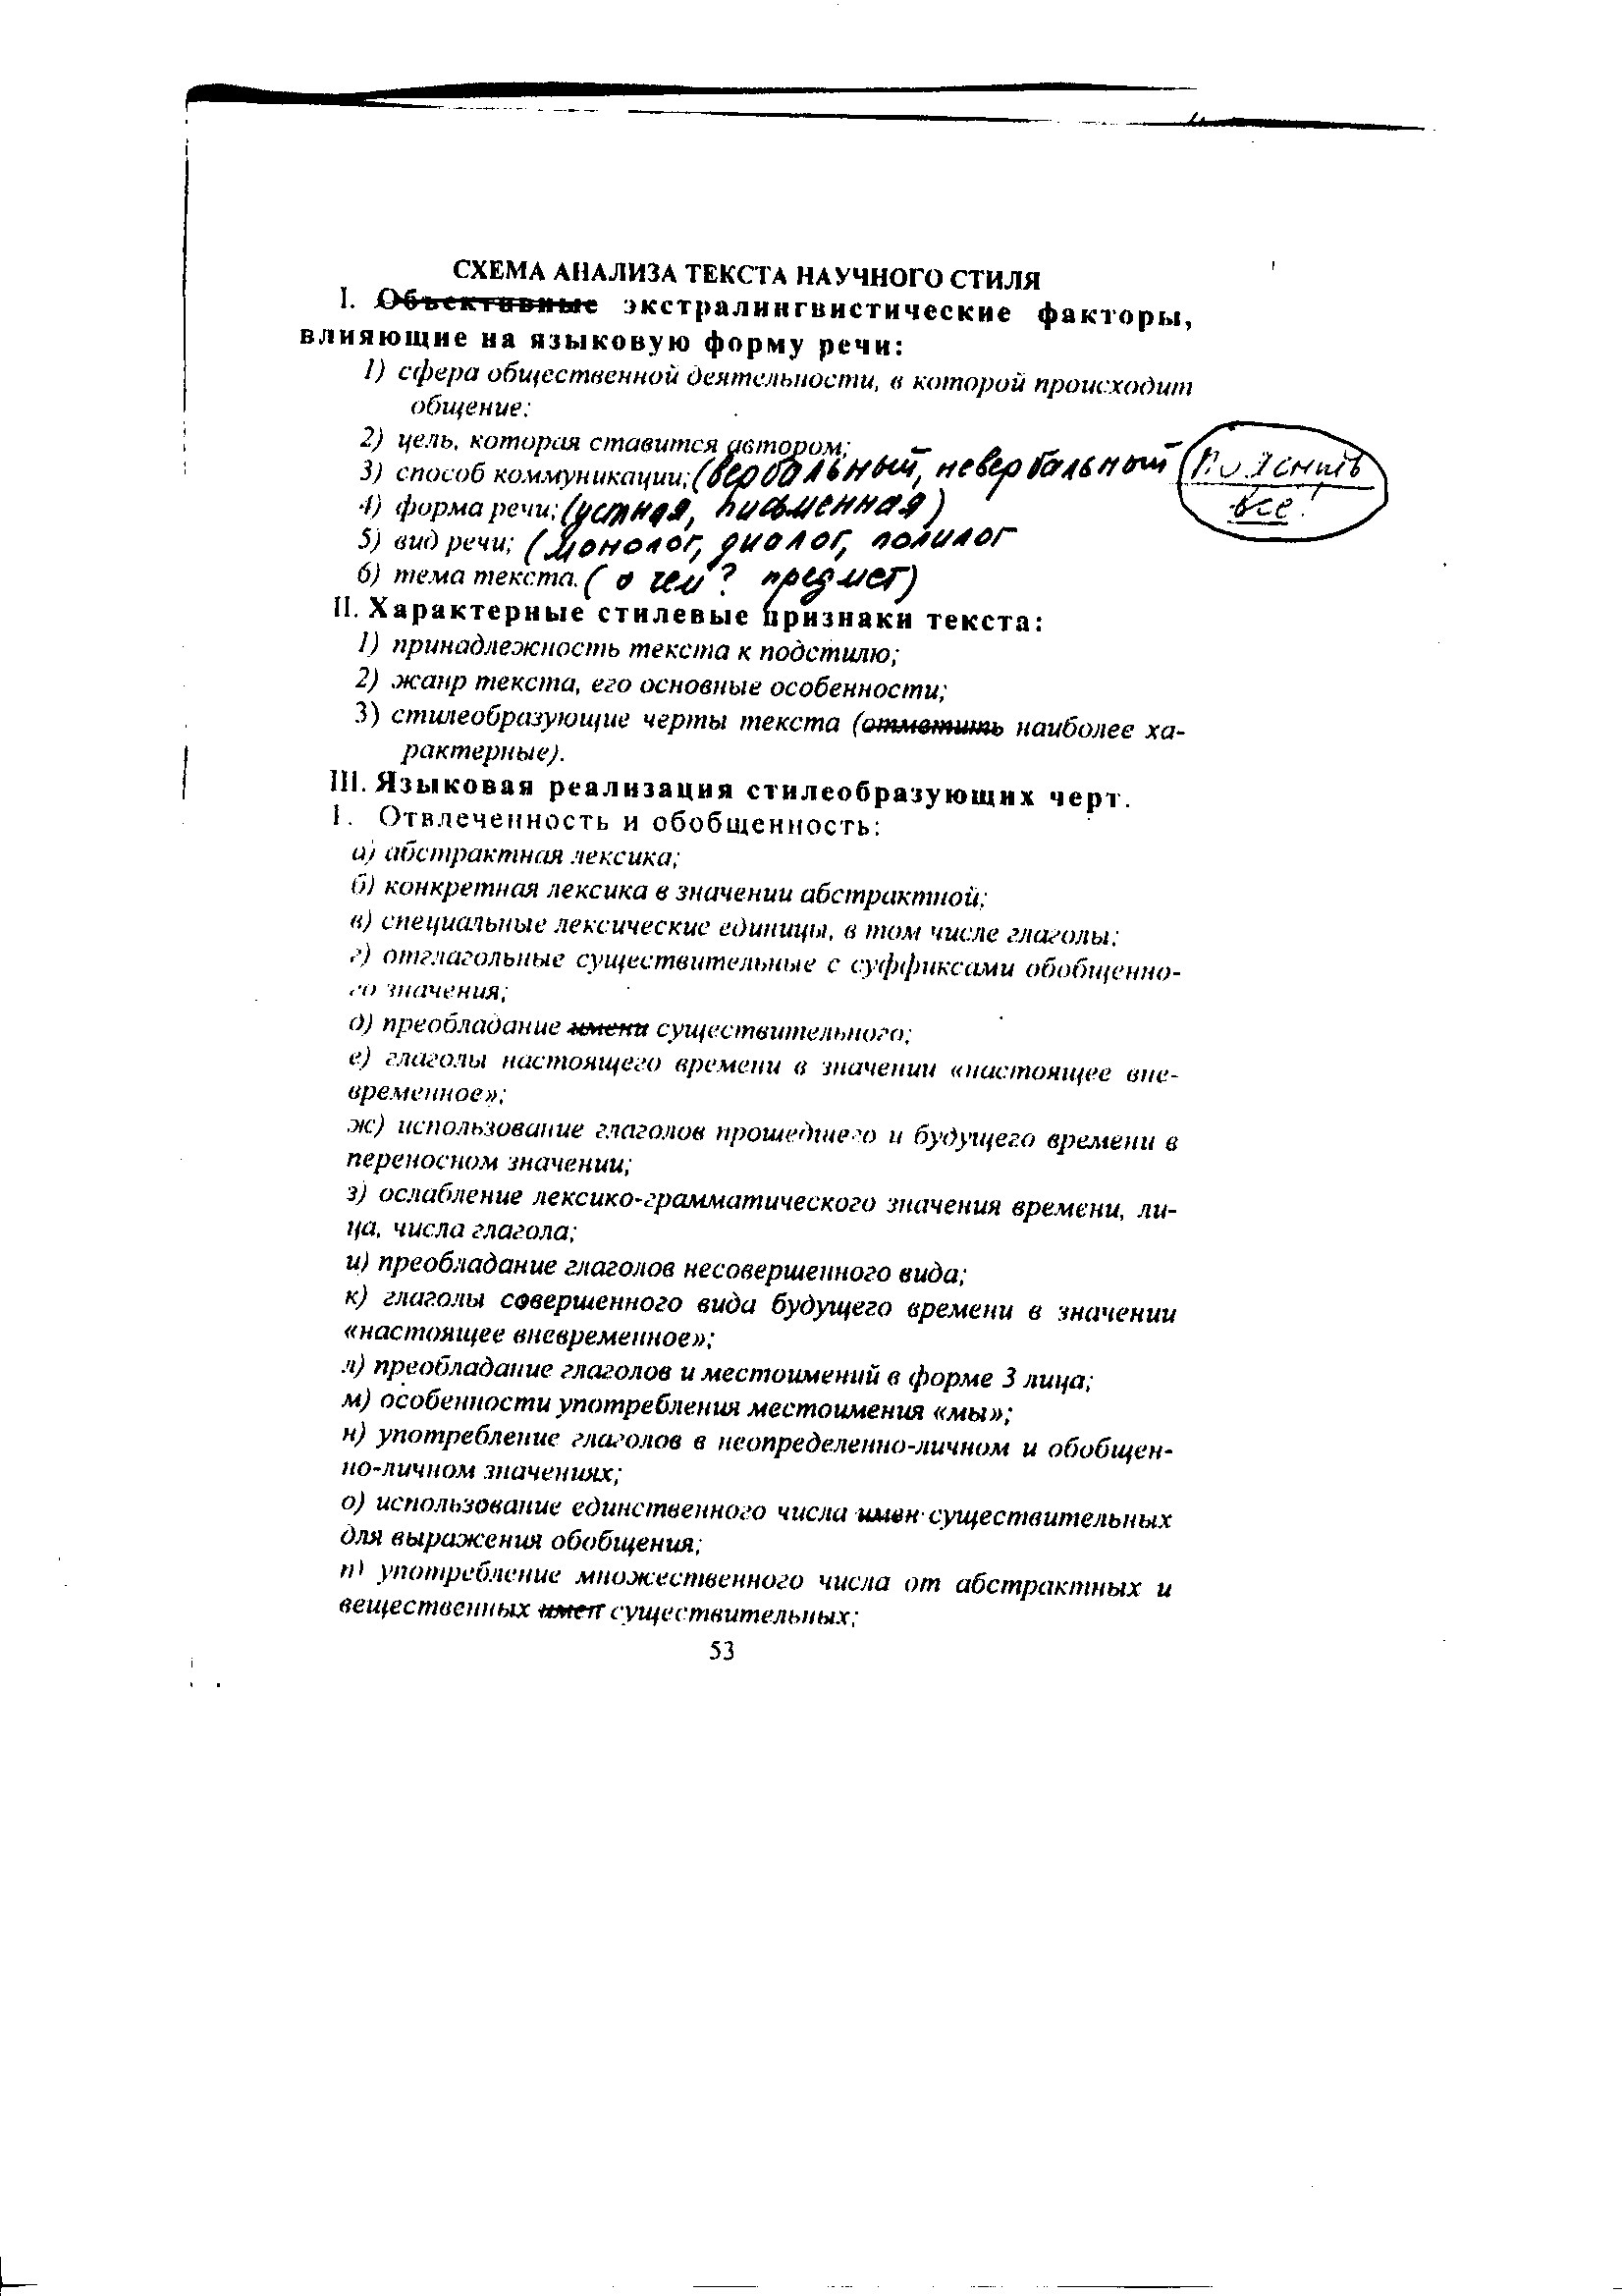 Учет и анализ оплаты труда (на примере ООО Меравит) - Ref by